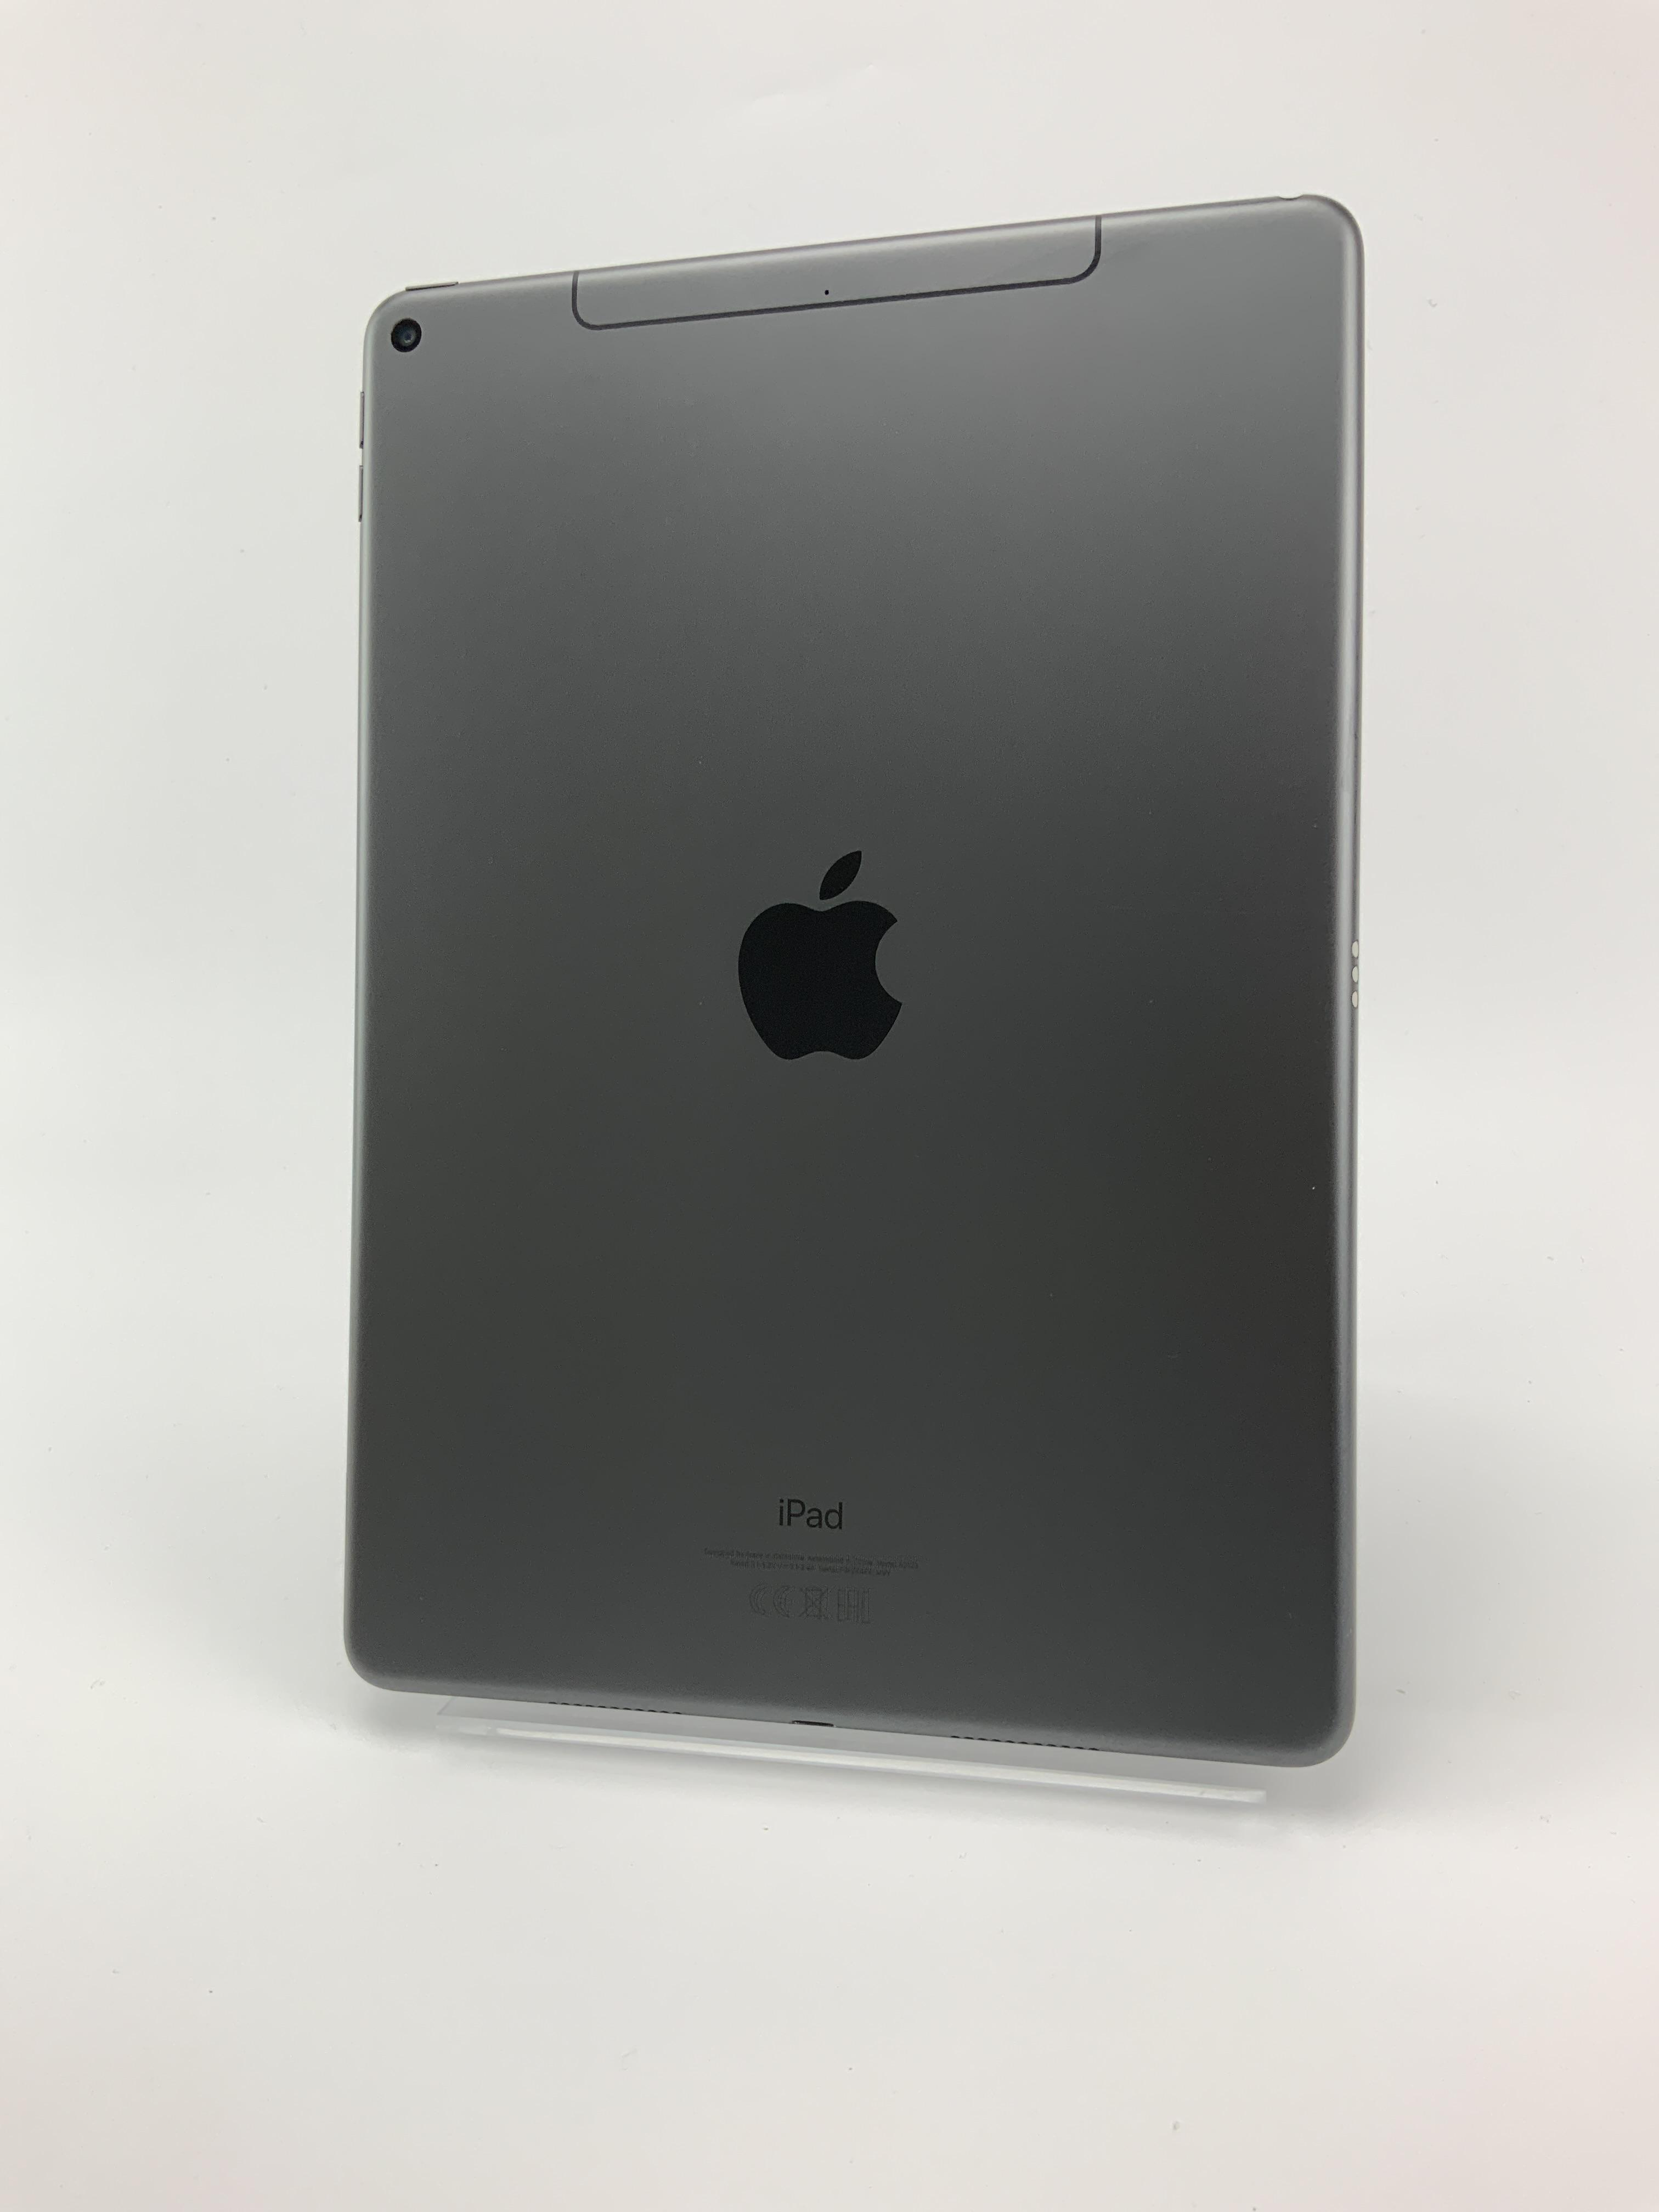 iPad Air 3 Wi-Fi + Cellular 64GB, 64GB, Space Gray, Bild 2